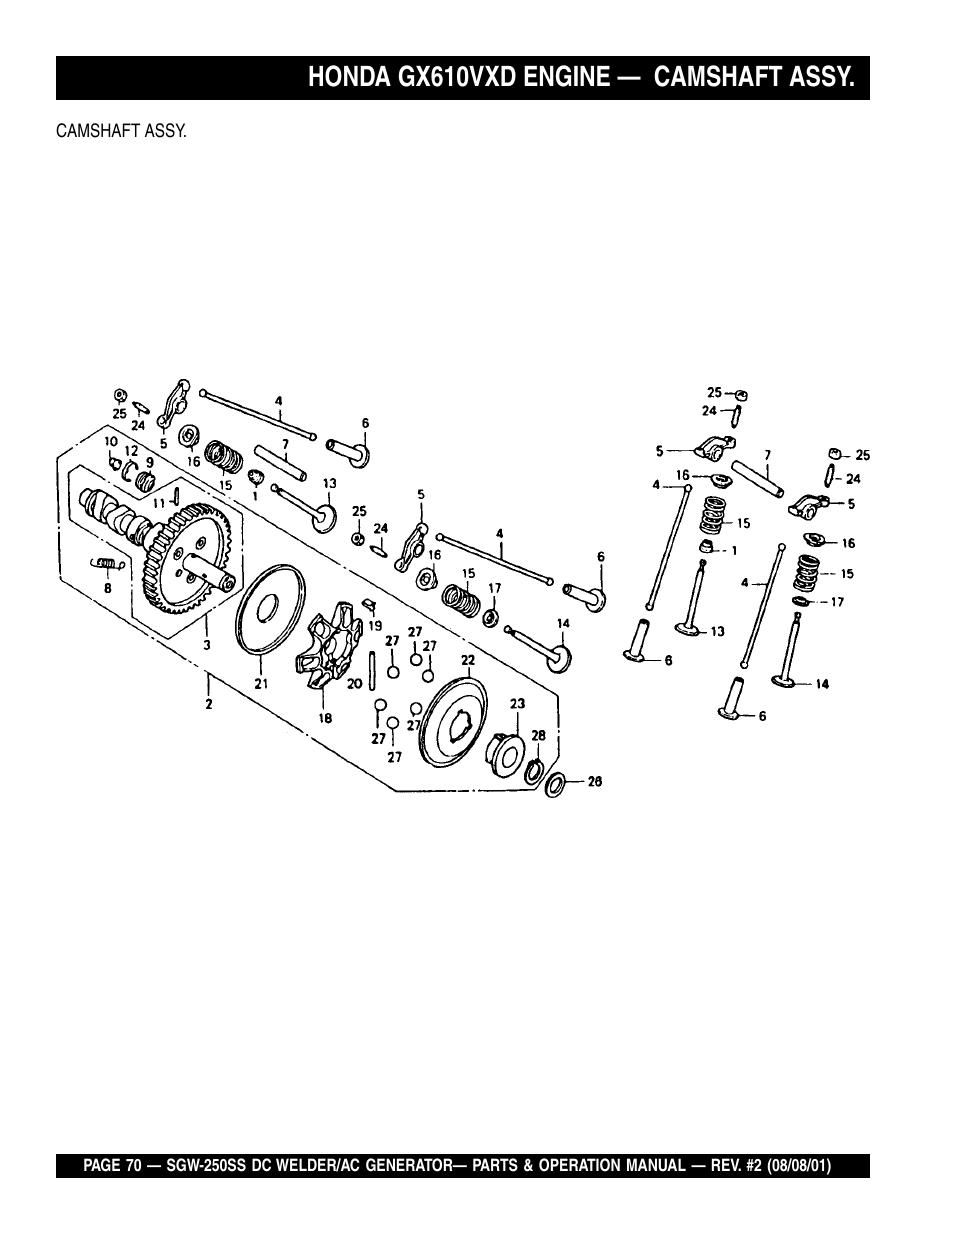 Honda gx610vxd engine — camshaft assy | Multiquip MQ Power Whisperweld DC  Welder/AC Generator SGW-250SS User Manual | Page 70 / 92